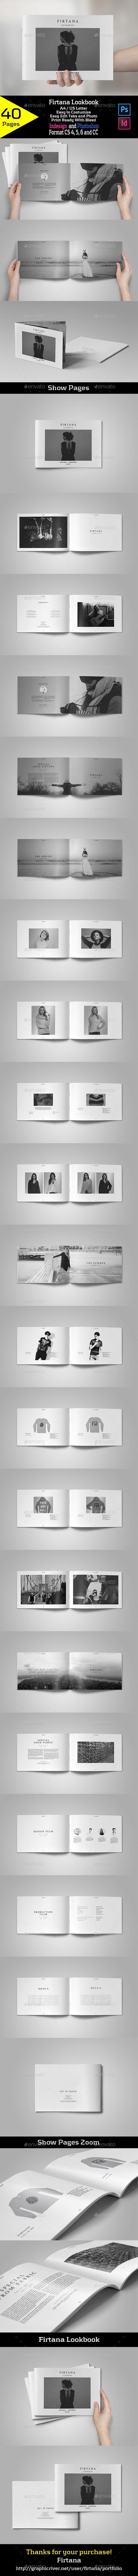 Firtana Lookbook - Portfolio Brochures